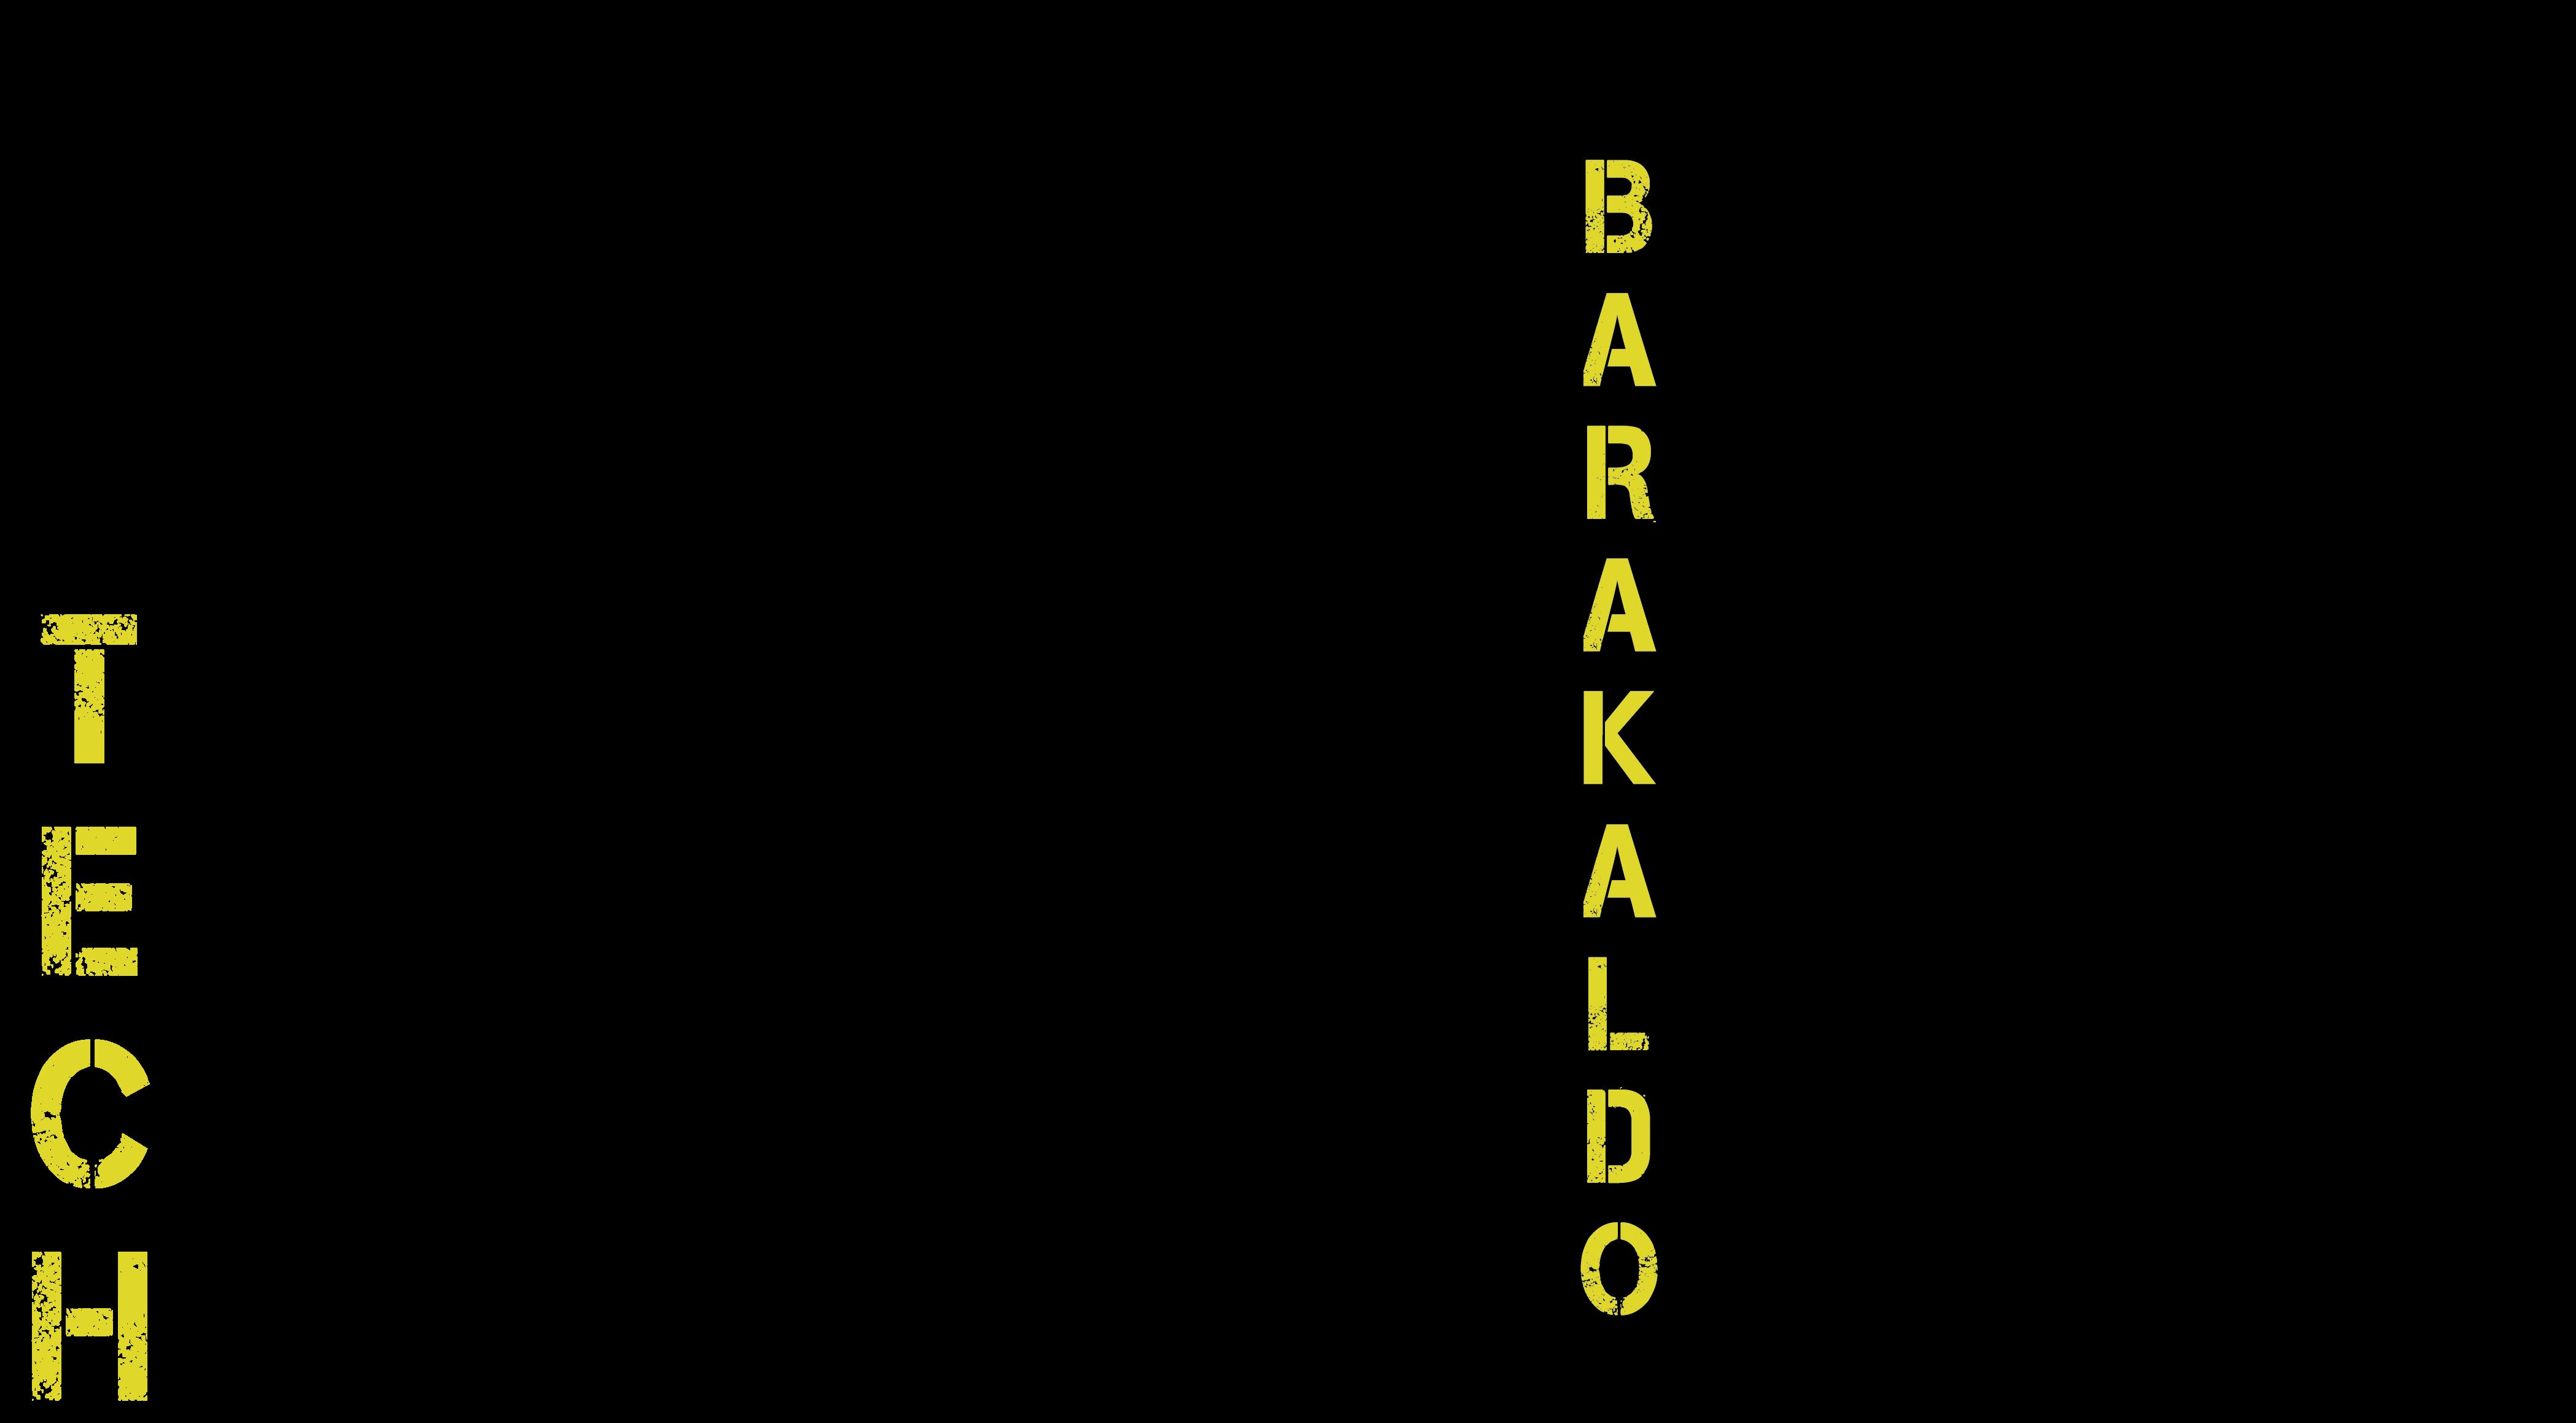 10k Barakaldo